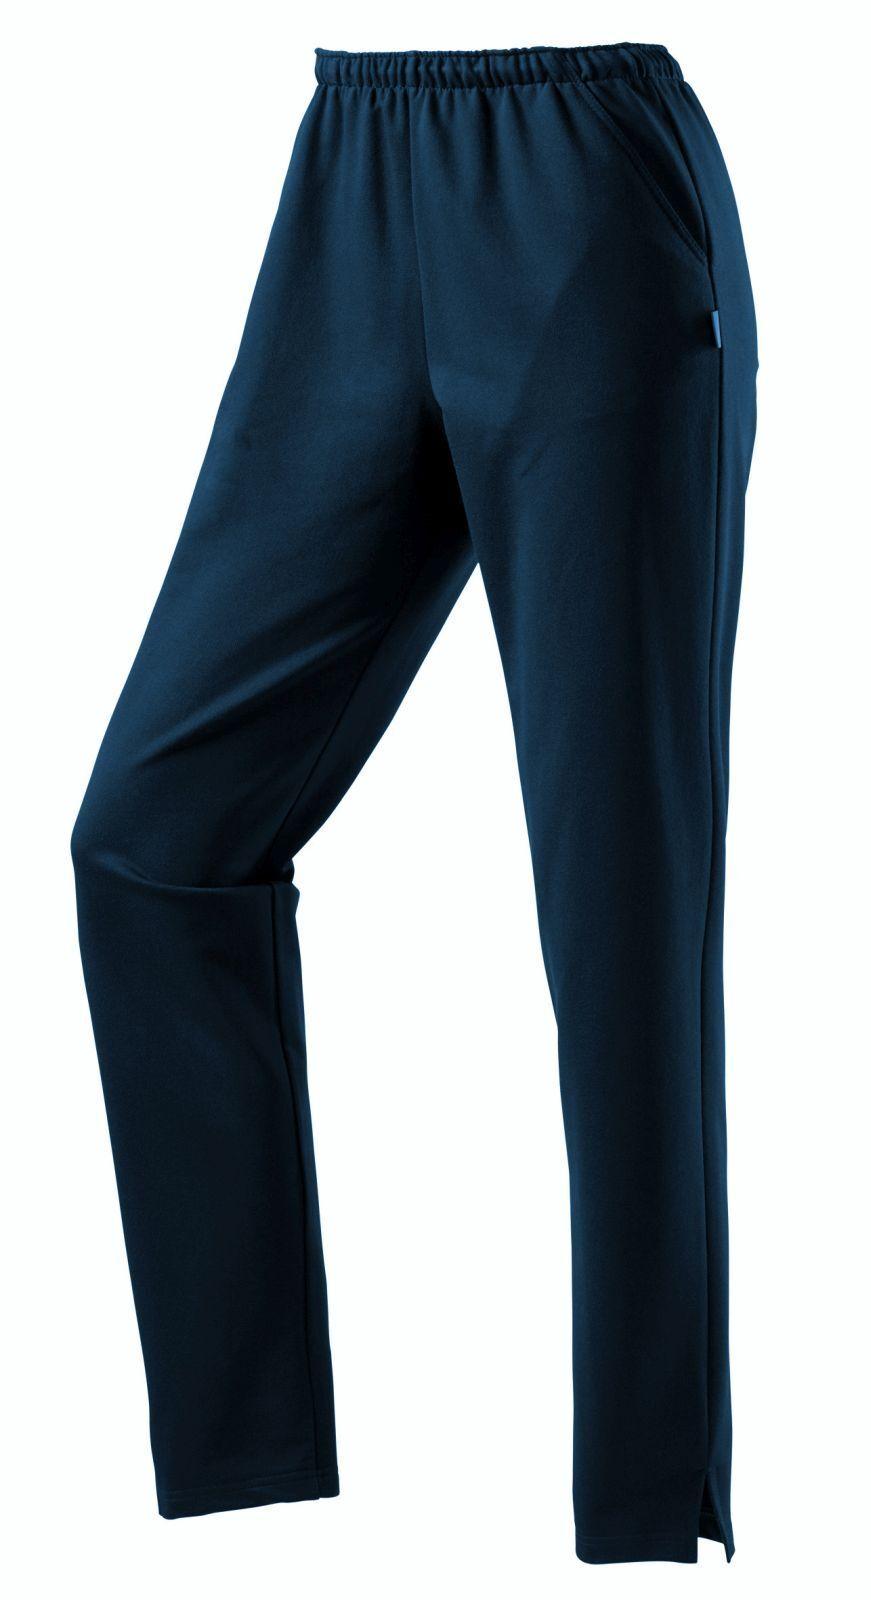 Schneider sportswear Damen Damen Damen Trainingshose ISCHGLW dunkelblau auch Kurzgrößen d2c416